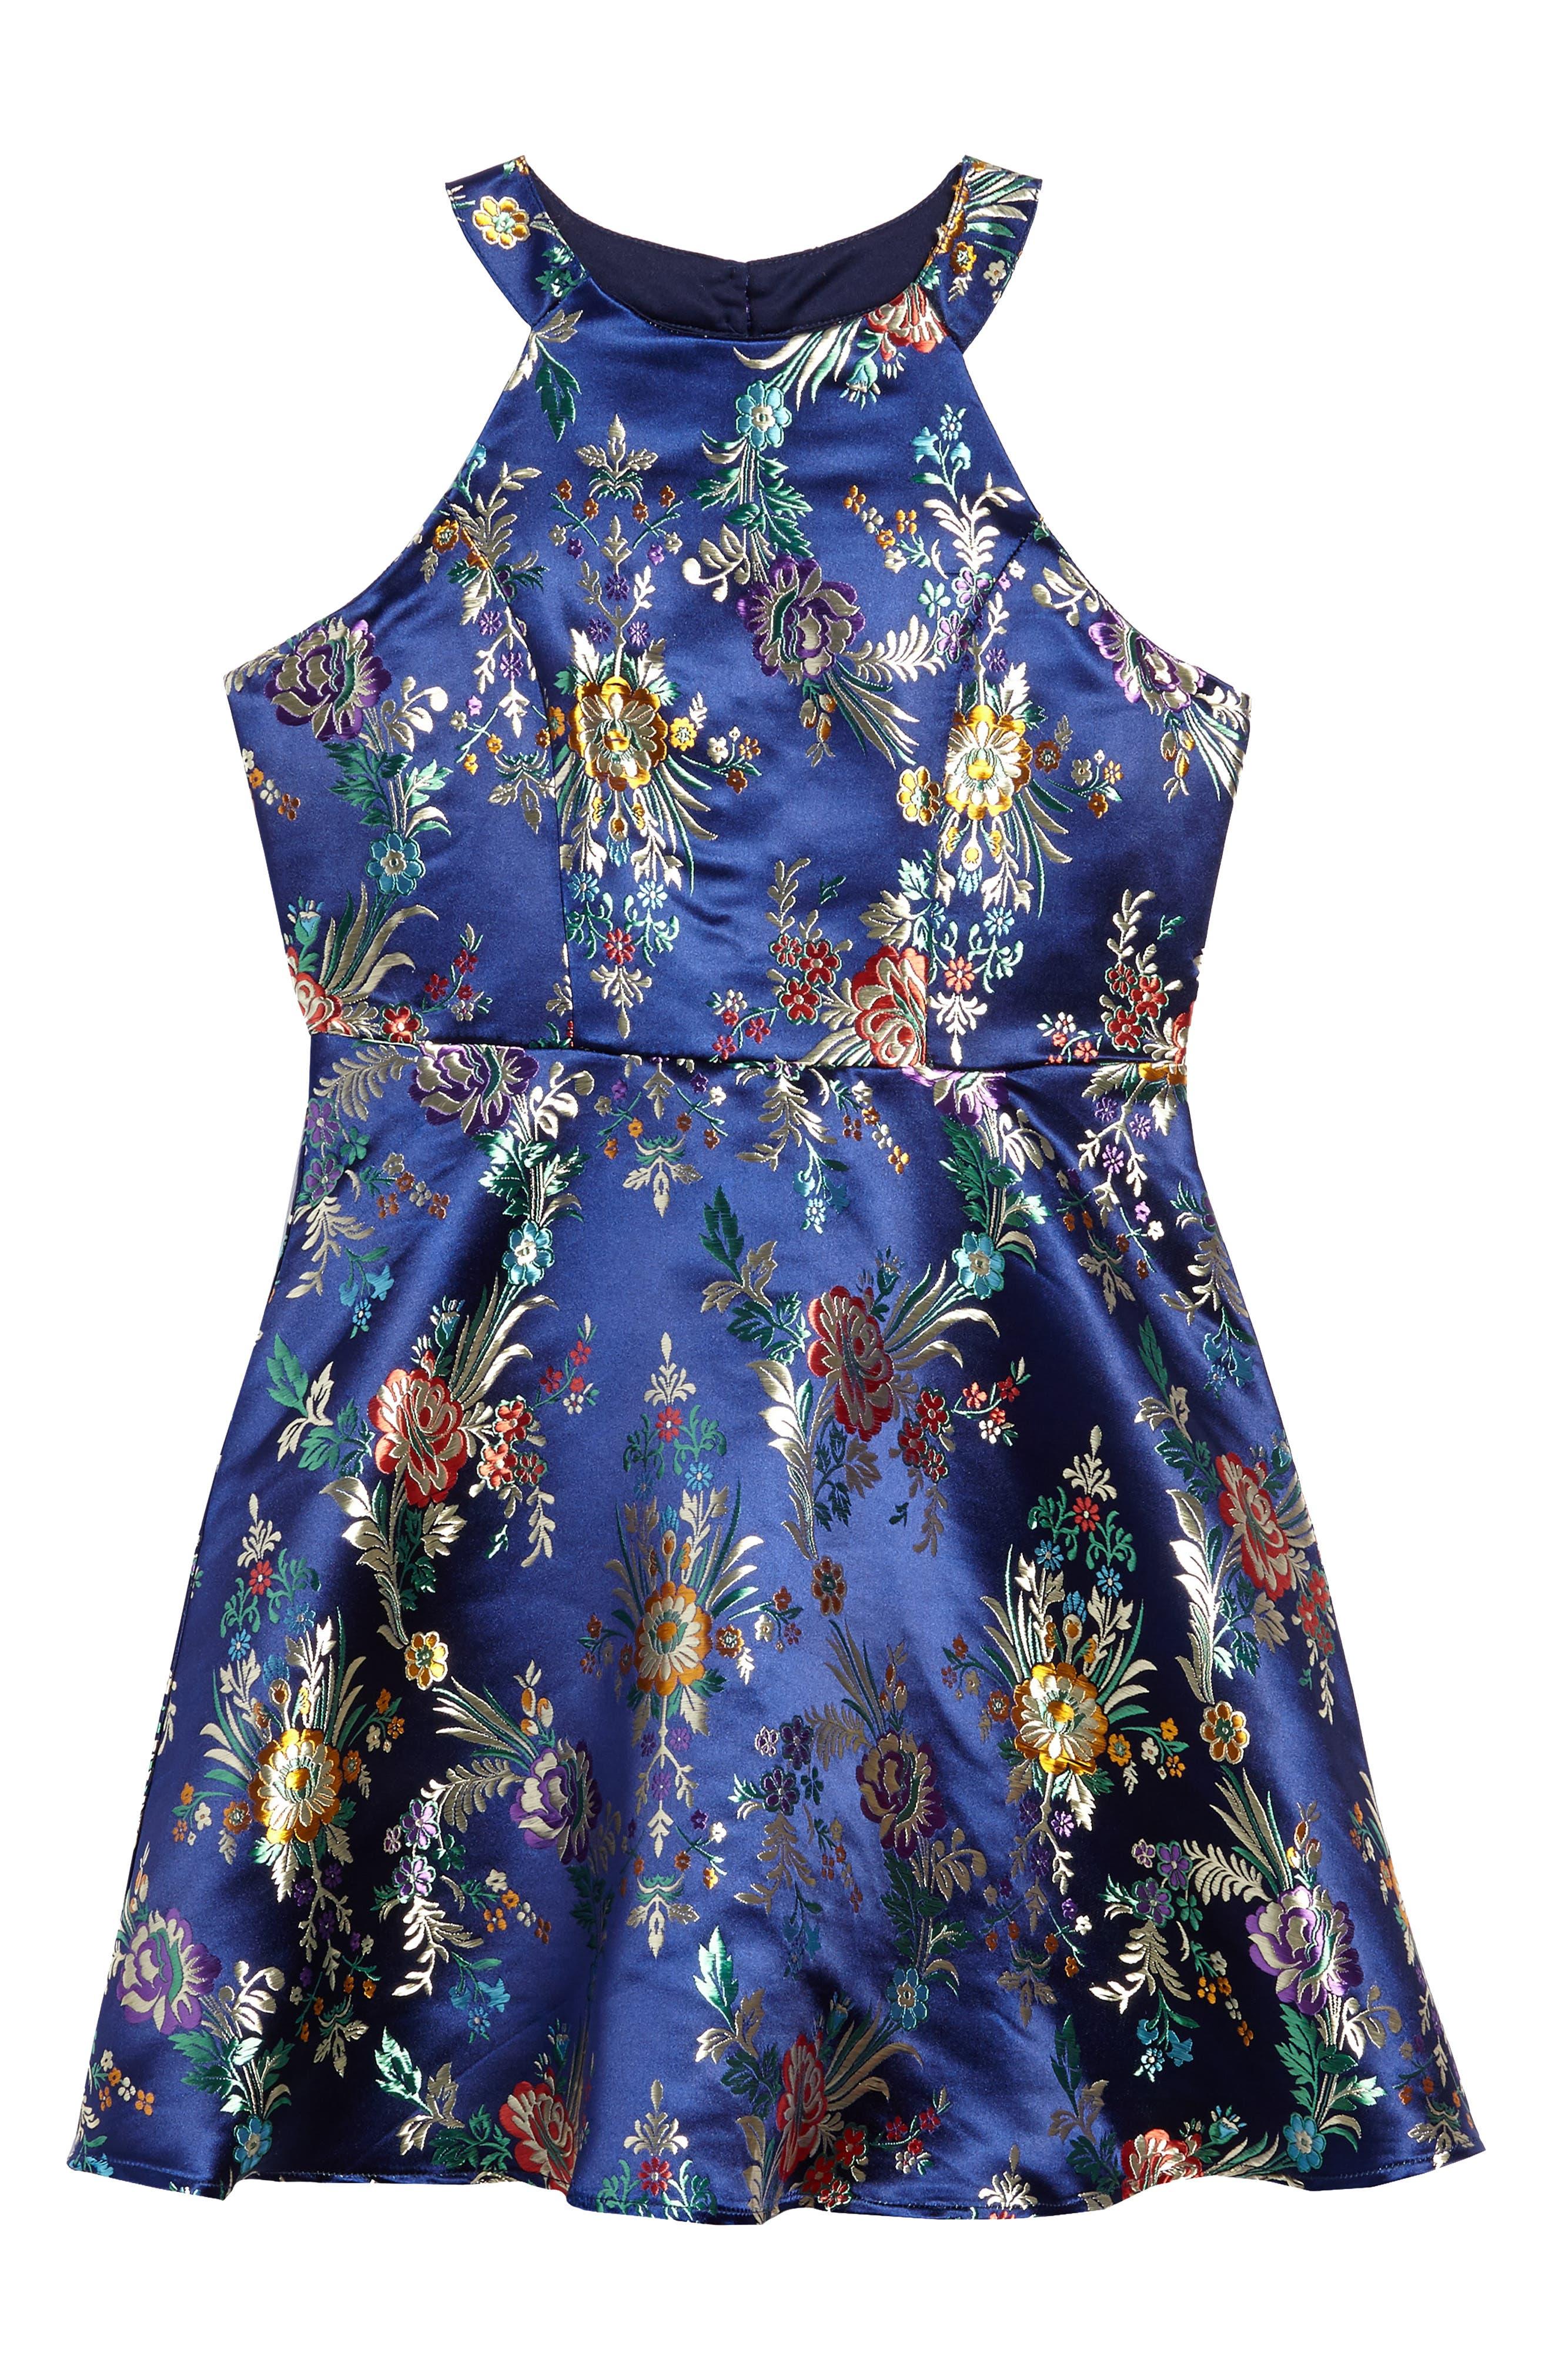 Metallic Floral Jacquard Dress,                             Main thumbnail 1, color,                             436